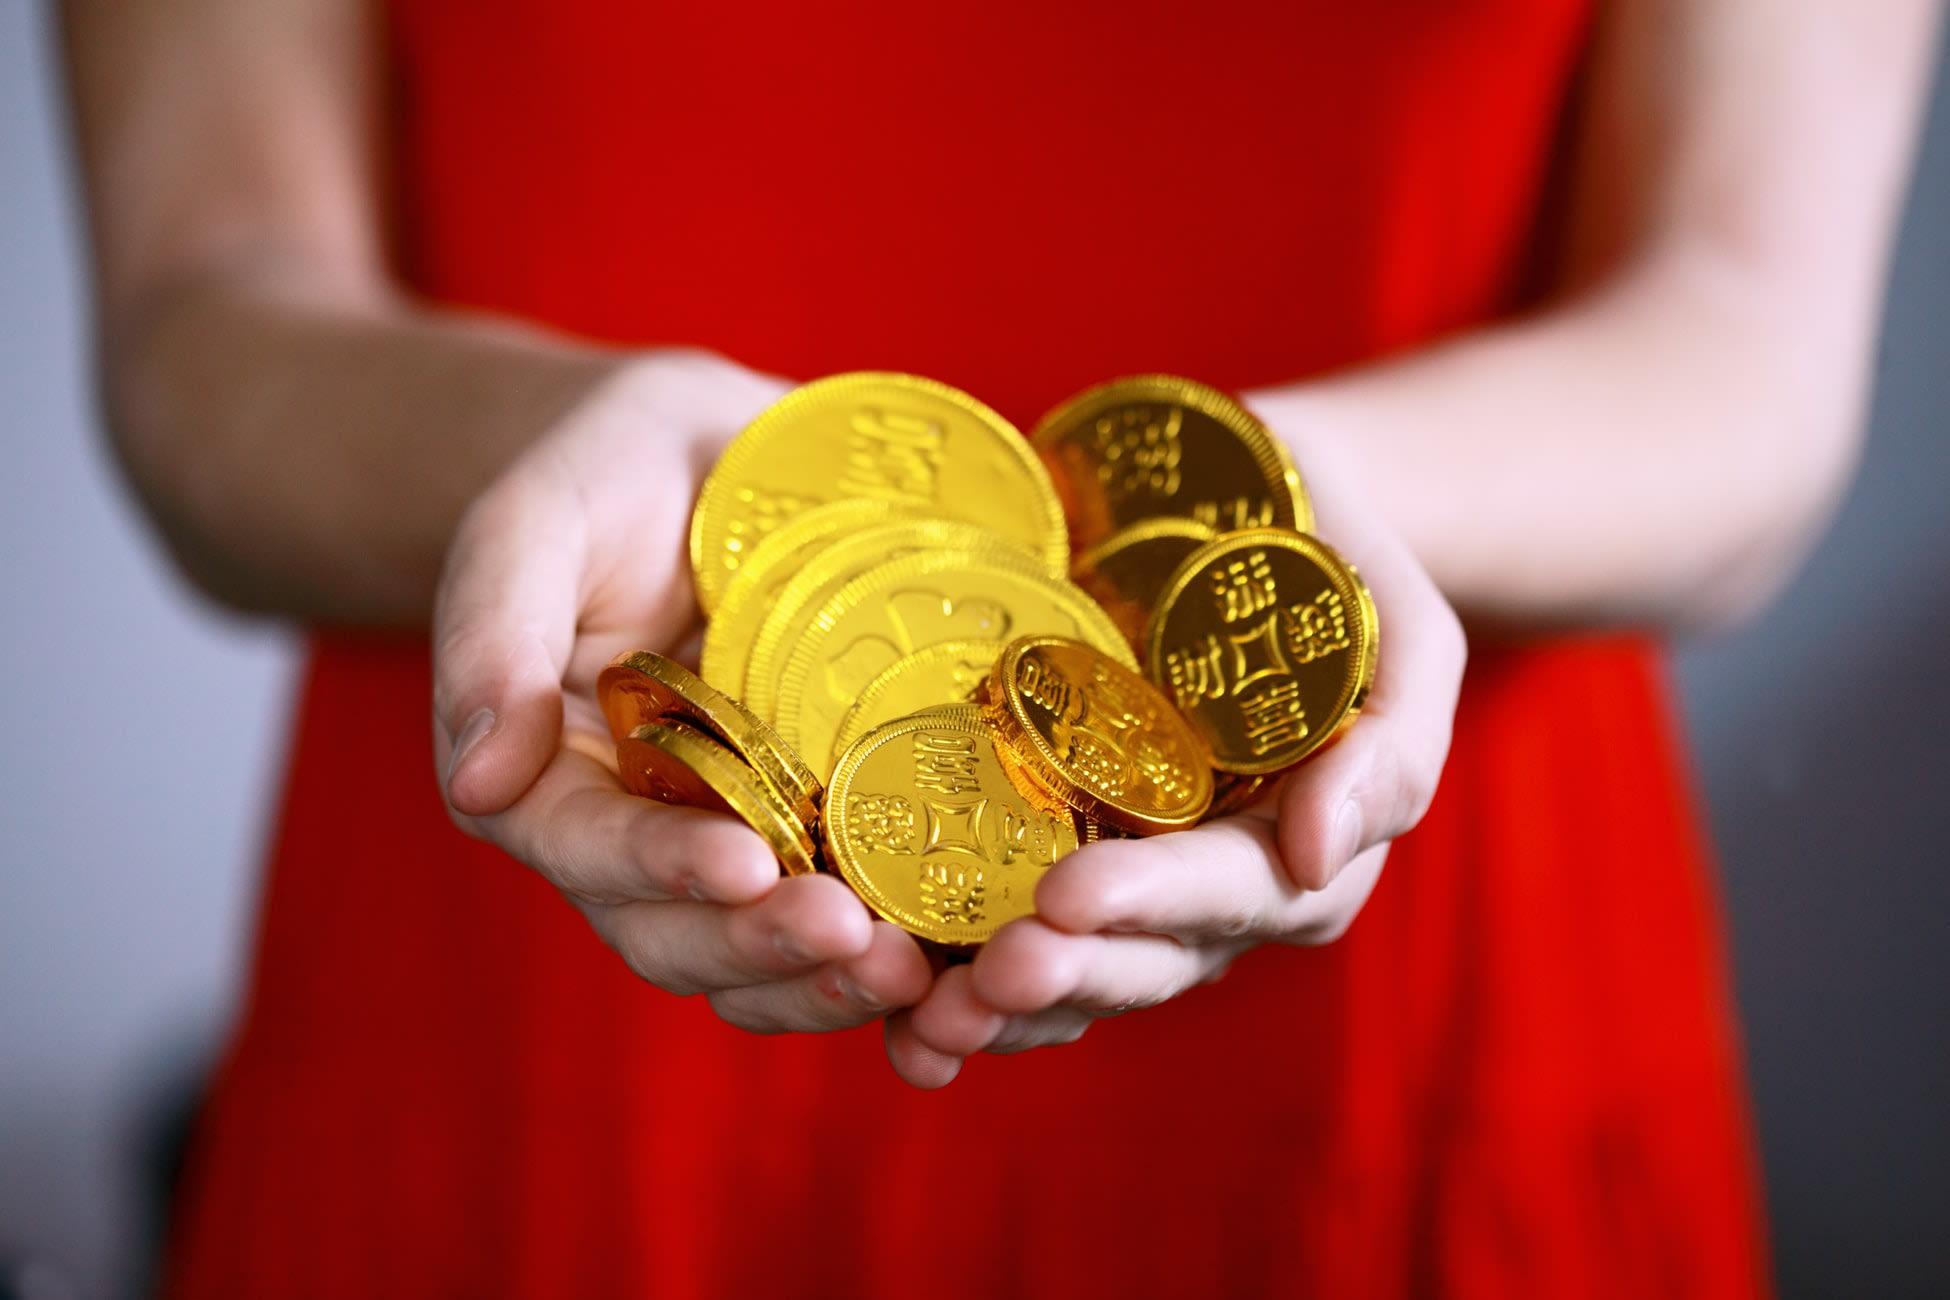 Brilliant Bitcoin - Επανάσταση στη βιομηχανία του καζίνο